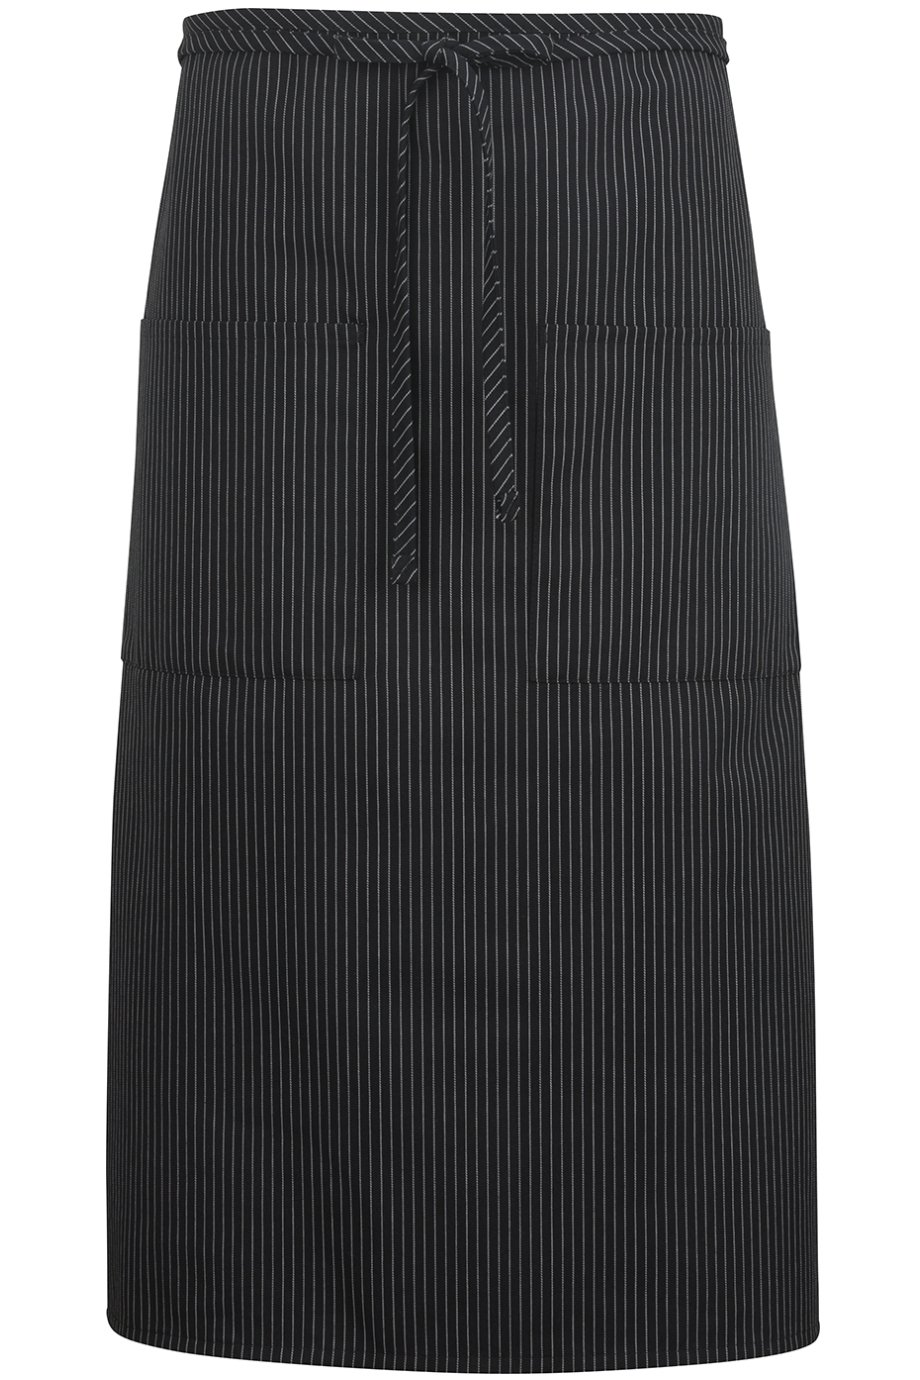 Edwards 2-Pocket Long Bistro Apron, Black Stripe, 0